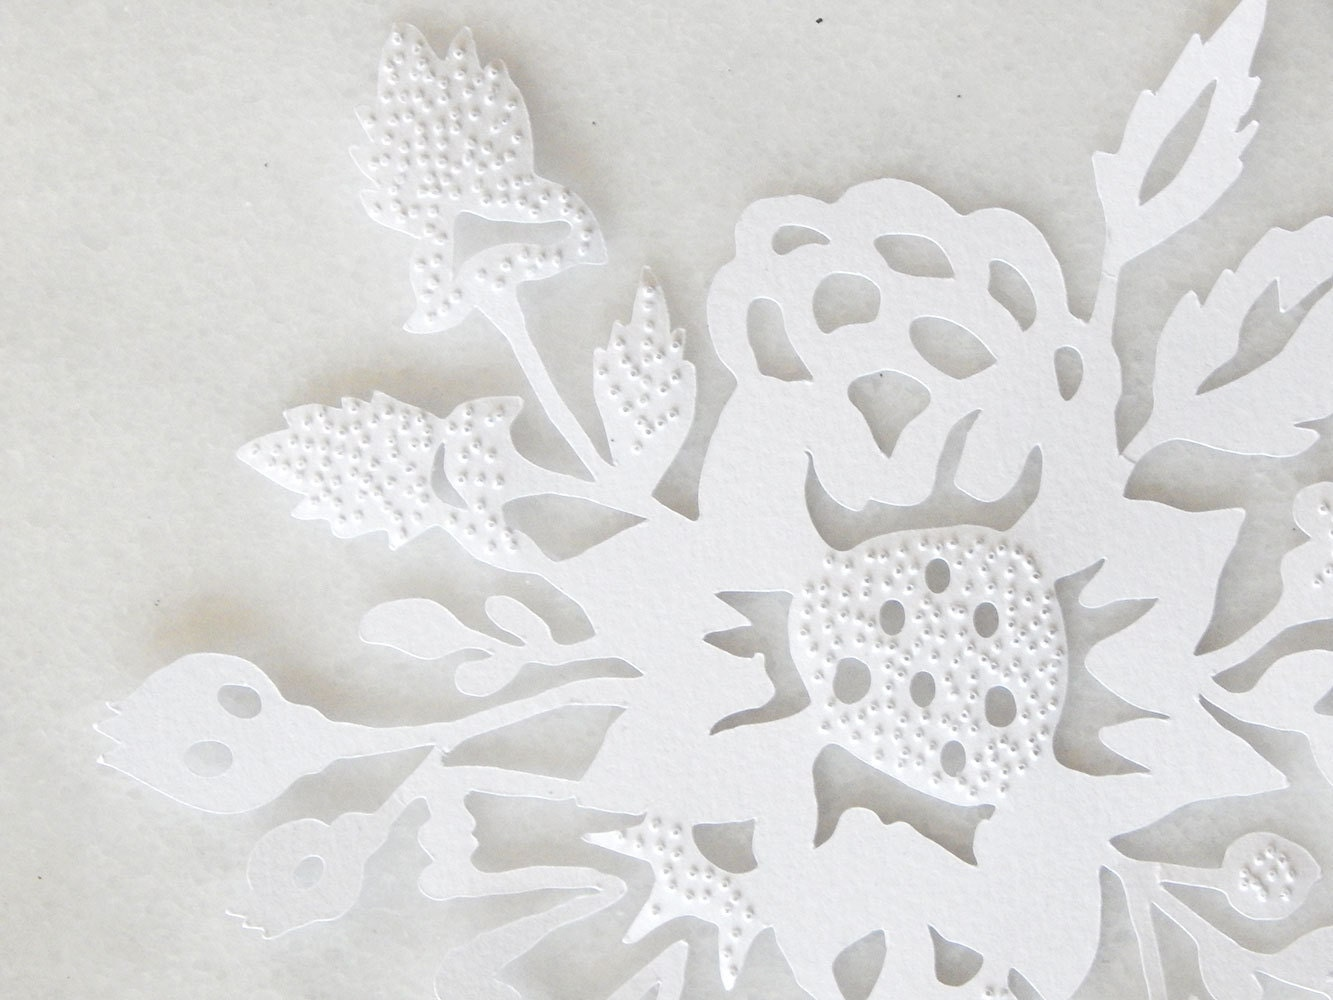 flower art  paper cut art  white flower paper cut  floral